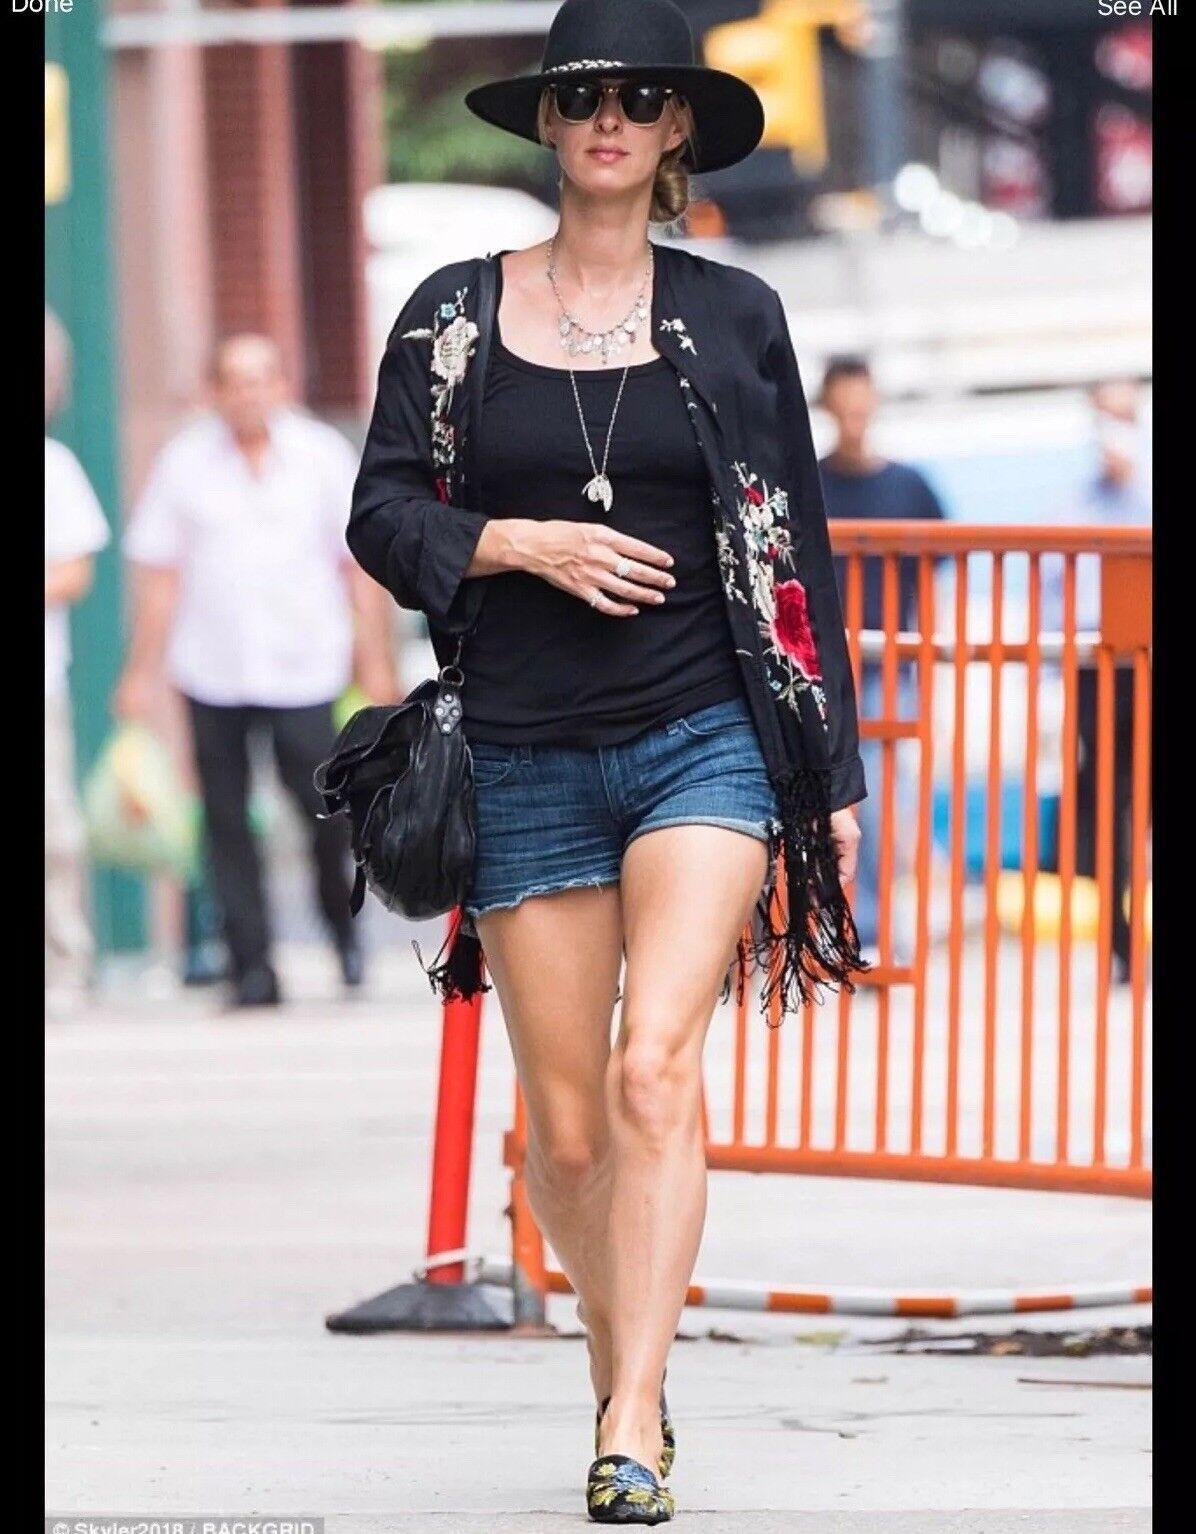 Zara Boho Embroiderot Kimono Blazer With Fringe Größe M Uk 10 Seen On Celebrities